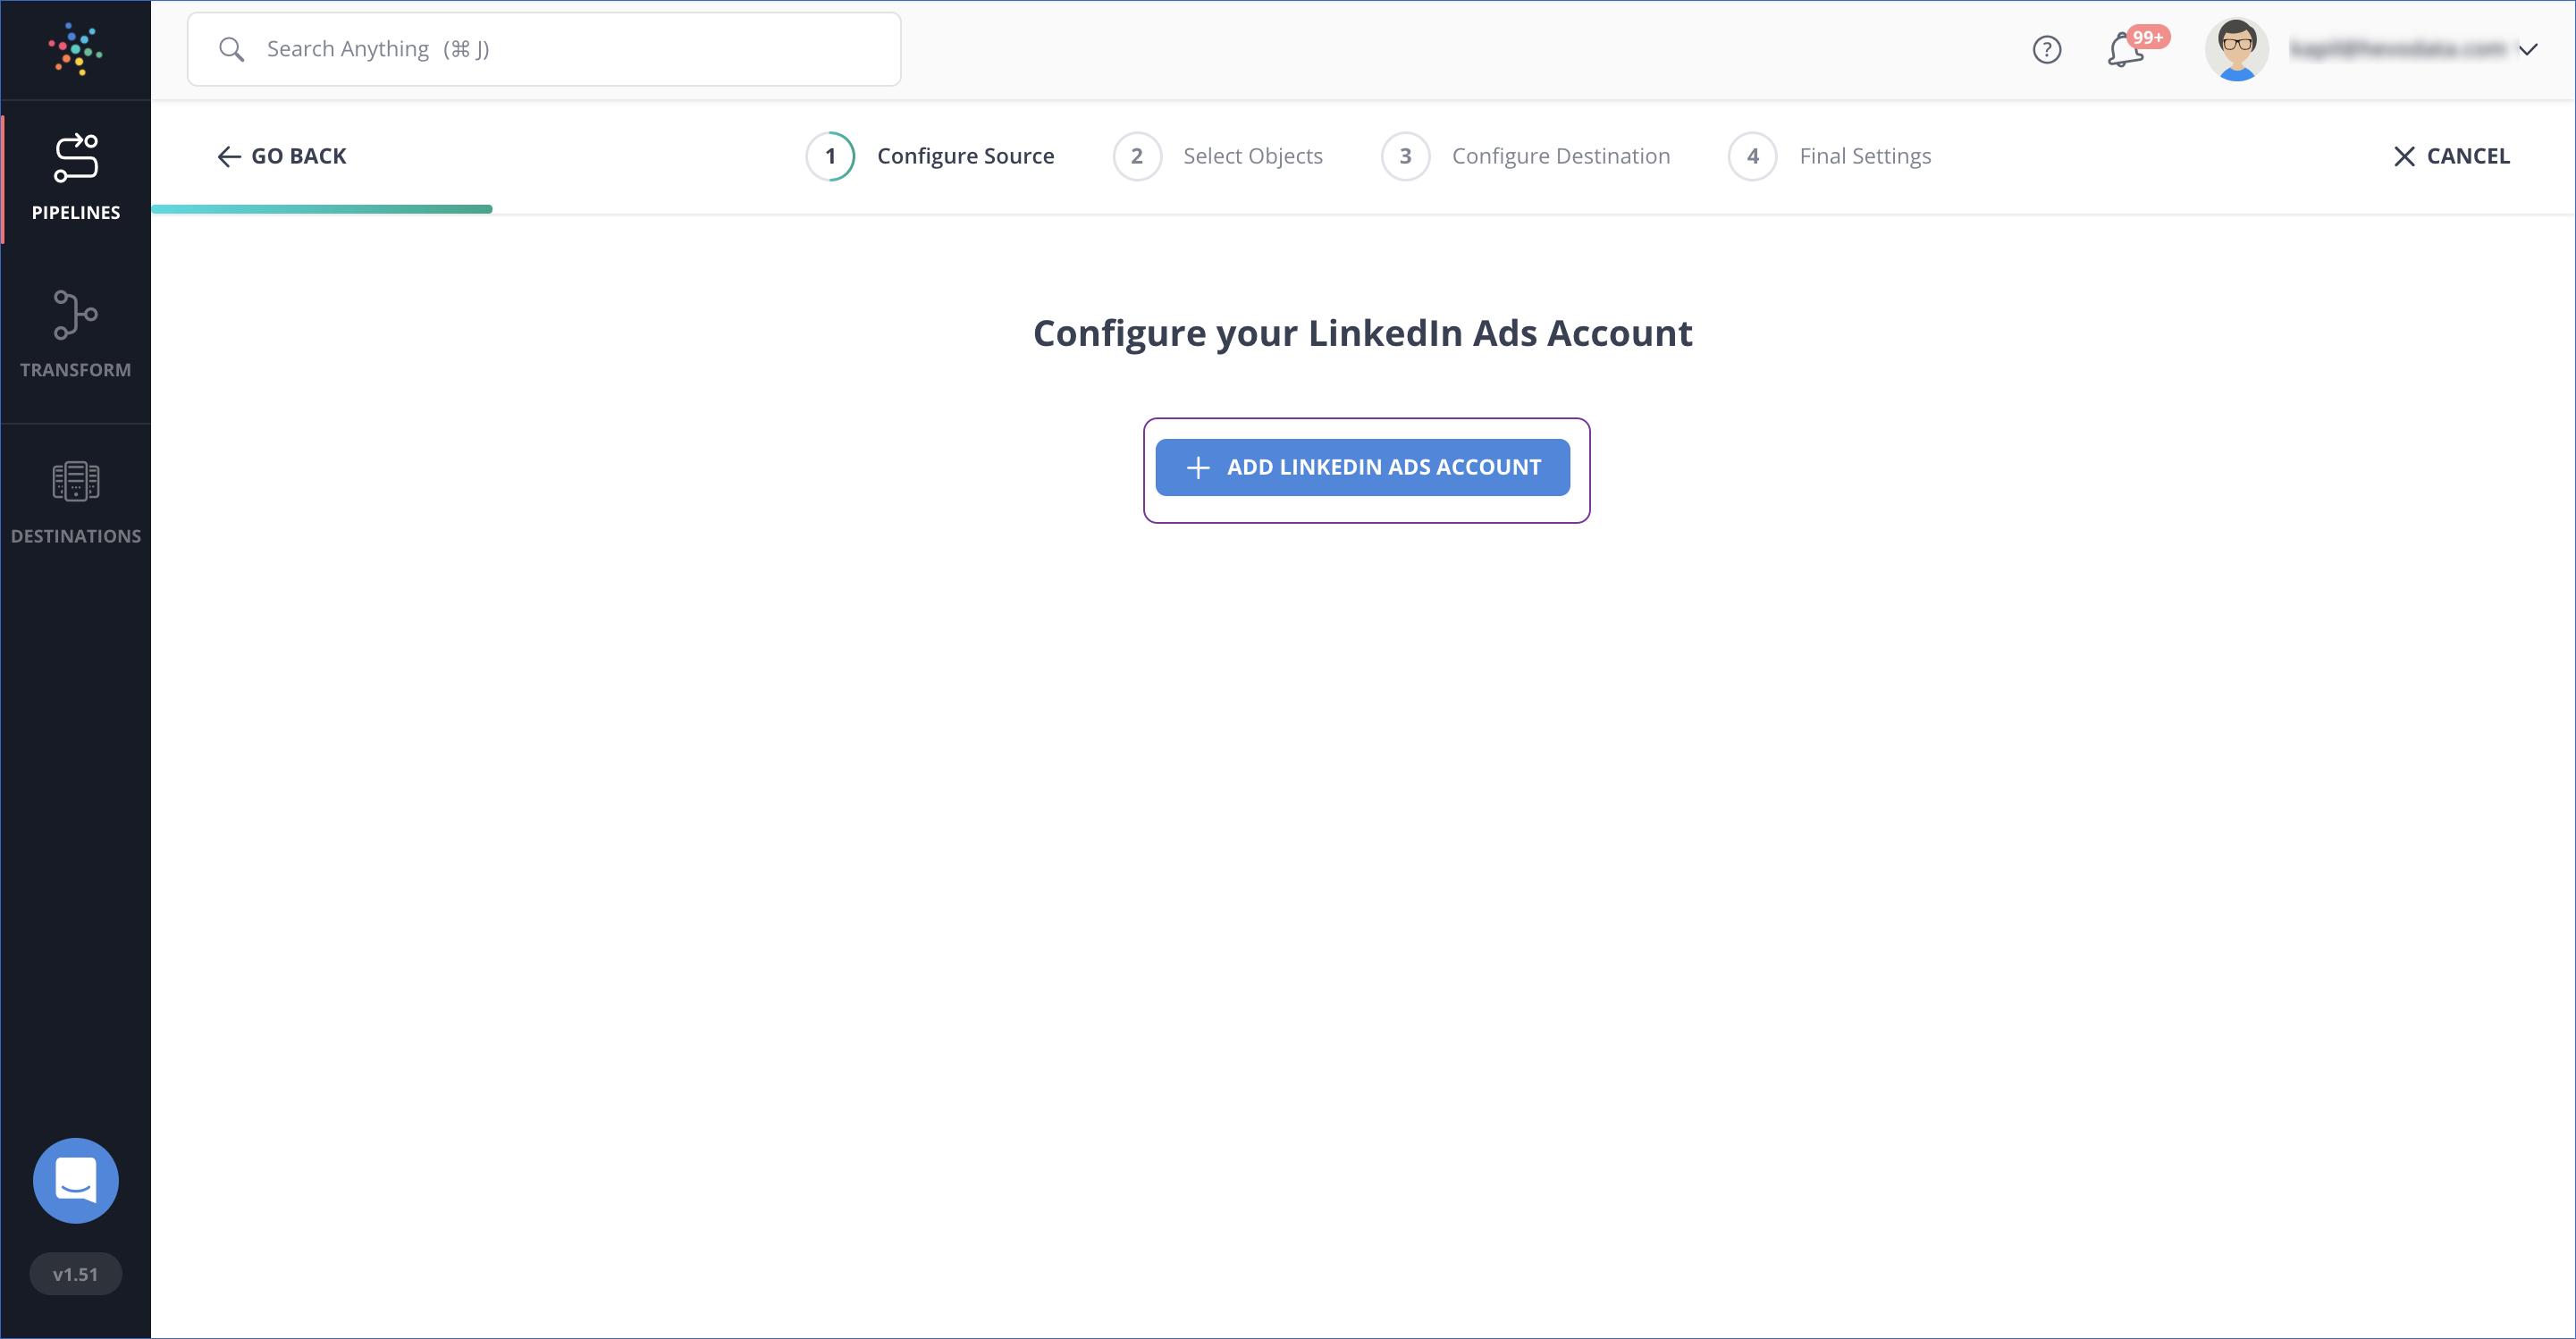 Add LinkedIn Ads Account